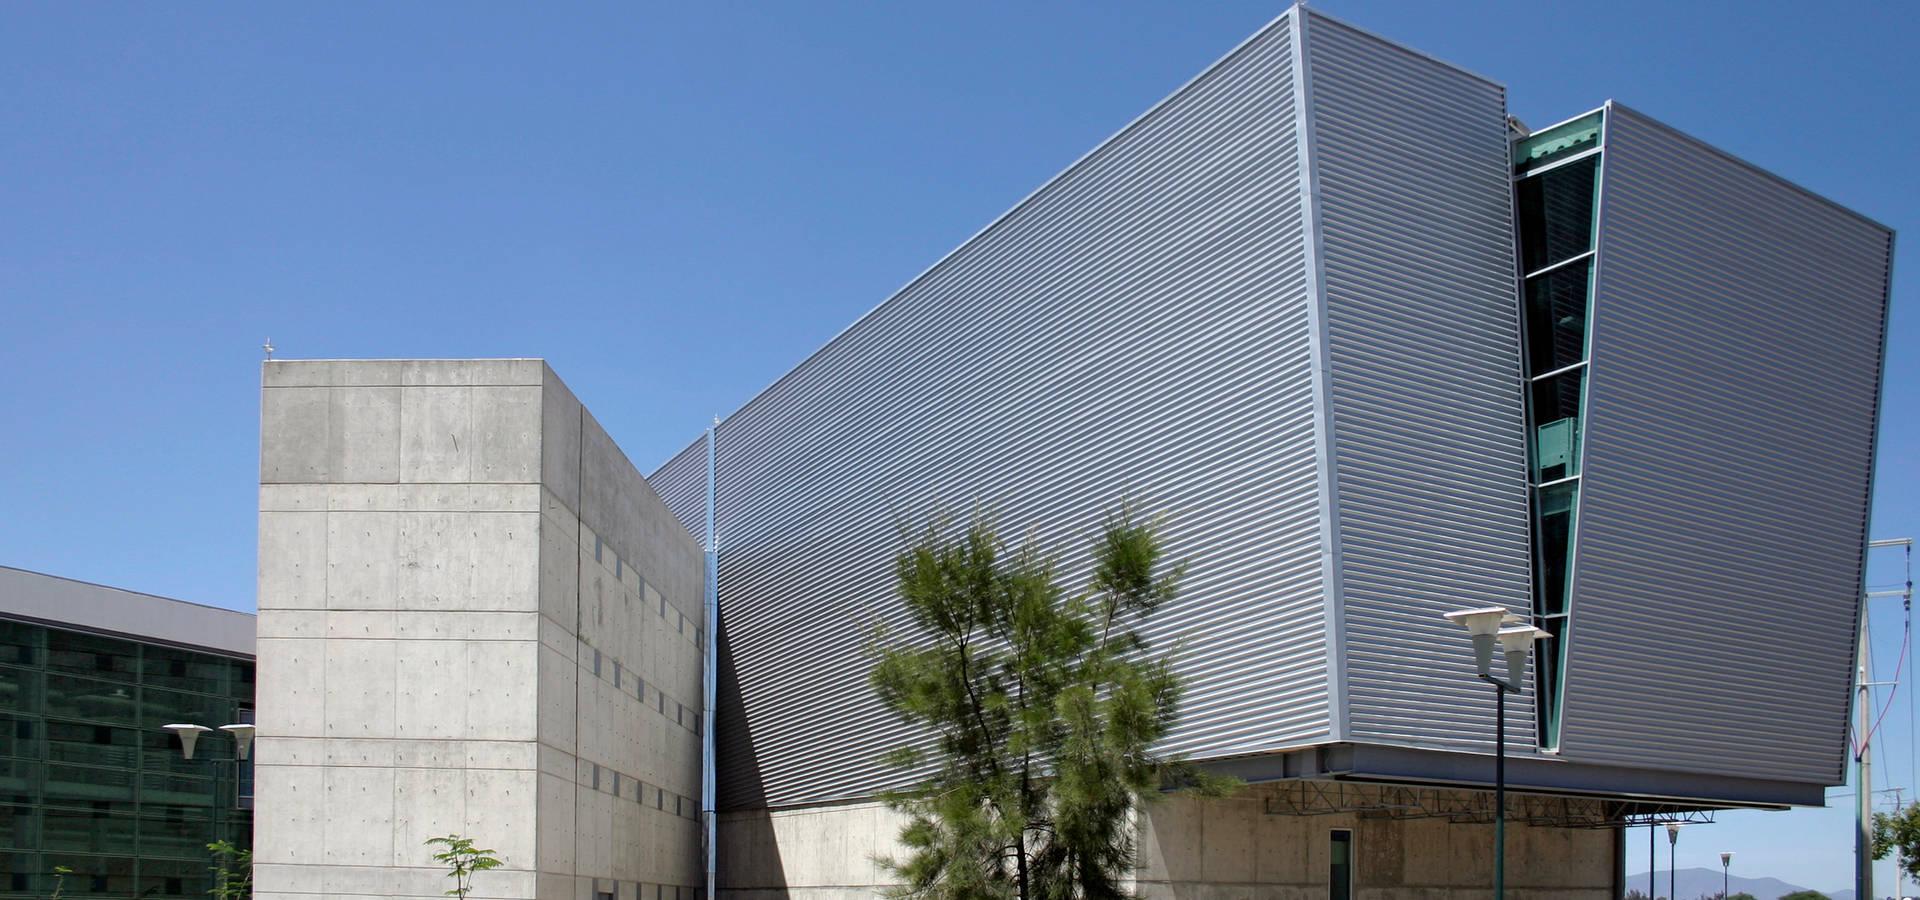 LEAP Laboratorio en Arquitectura Progresiva